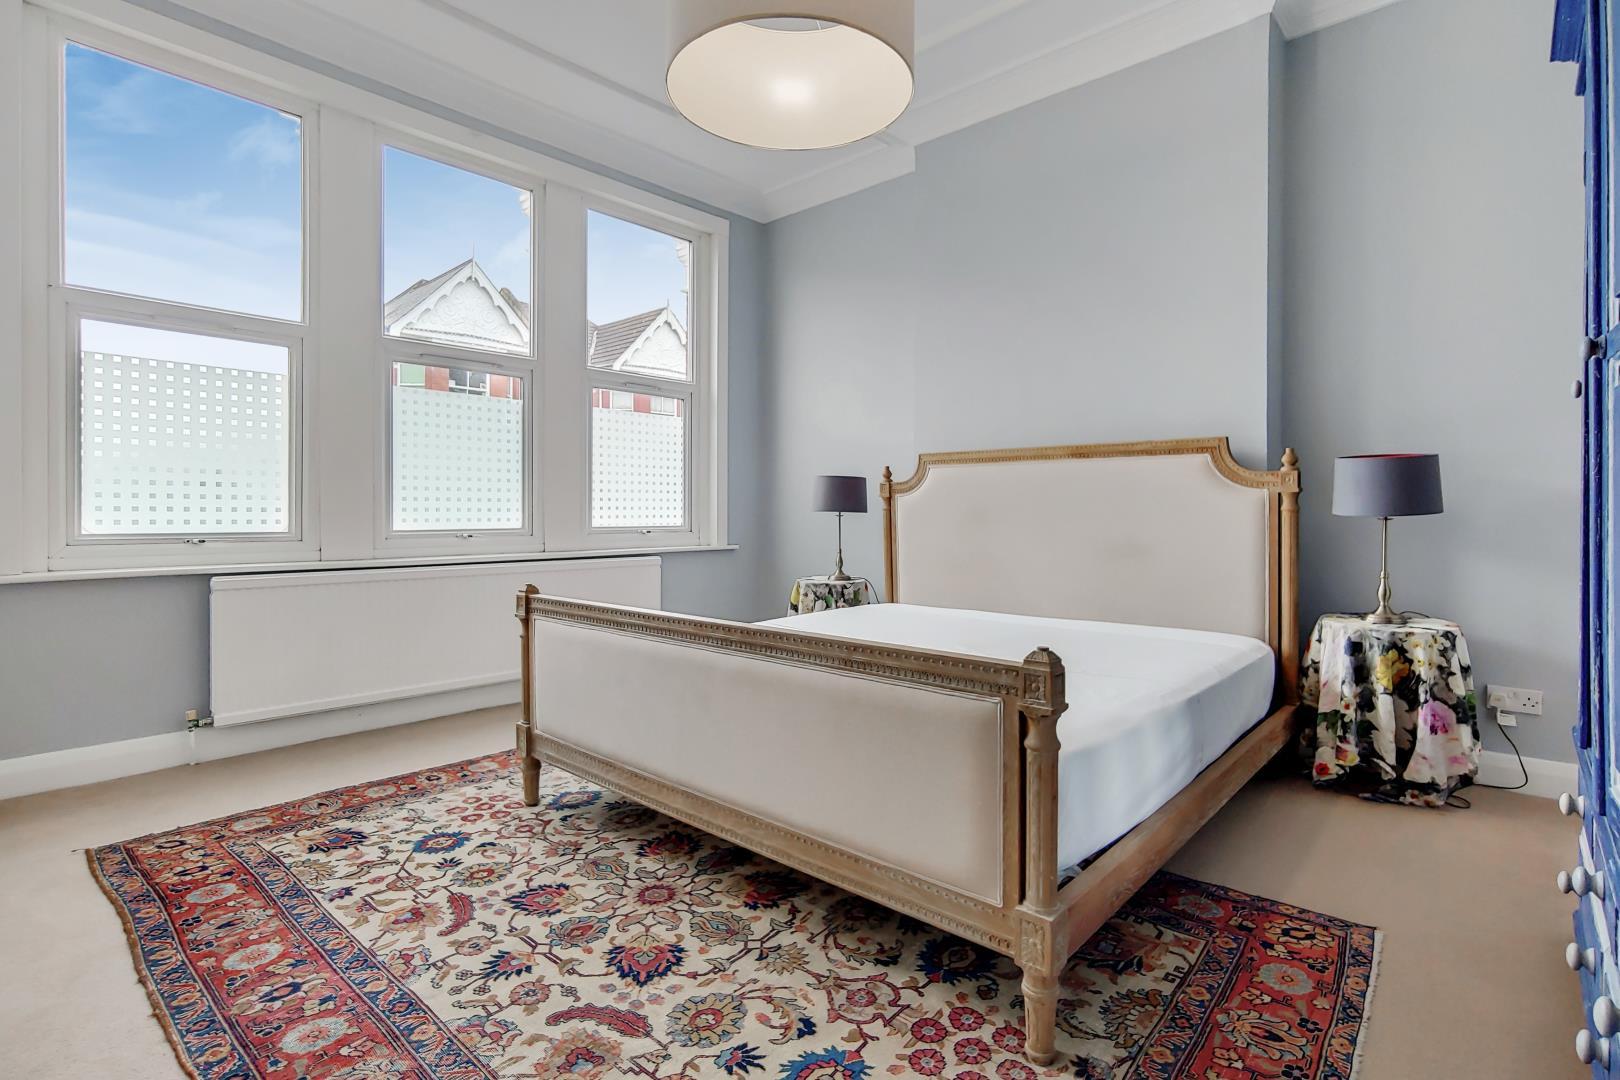 4_Bedroom-1.jpg